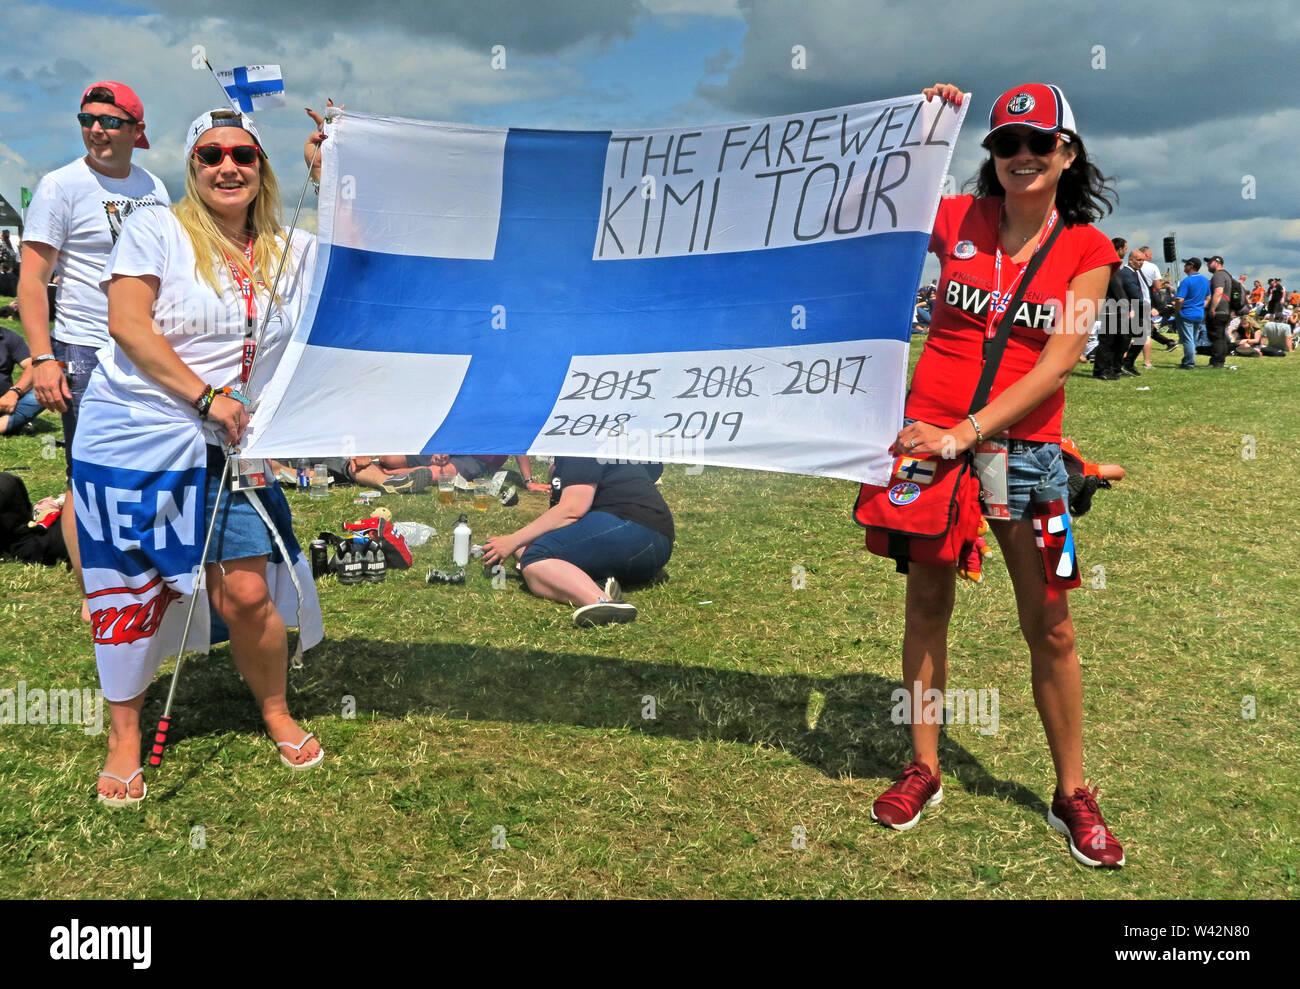 GoTonySmith,HotpixUK,@HotpixUK,Silverstone,Grand Prix,British,F1,Formula One,Formula 1,Formula1,UK,GB,GP F1,fan,fans,Great Britain,Towcester,Northamptonshire,NN12 8TN,Raikkonen,iceman,Finnish,Finland,flag,with flag,2015,2016,2017,2018,2019,Farewell Kimi,women,girls,females,Finn,two girls,girls holding flag,two women